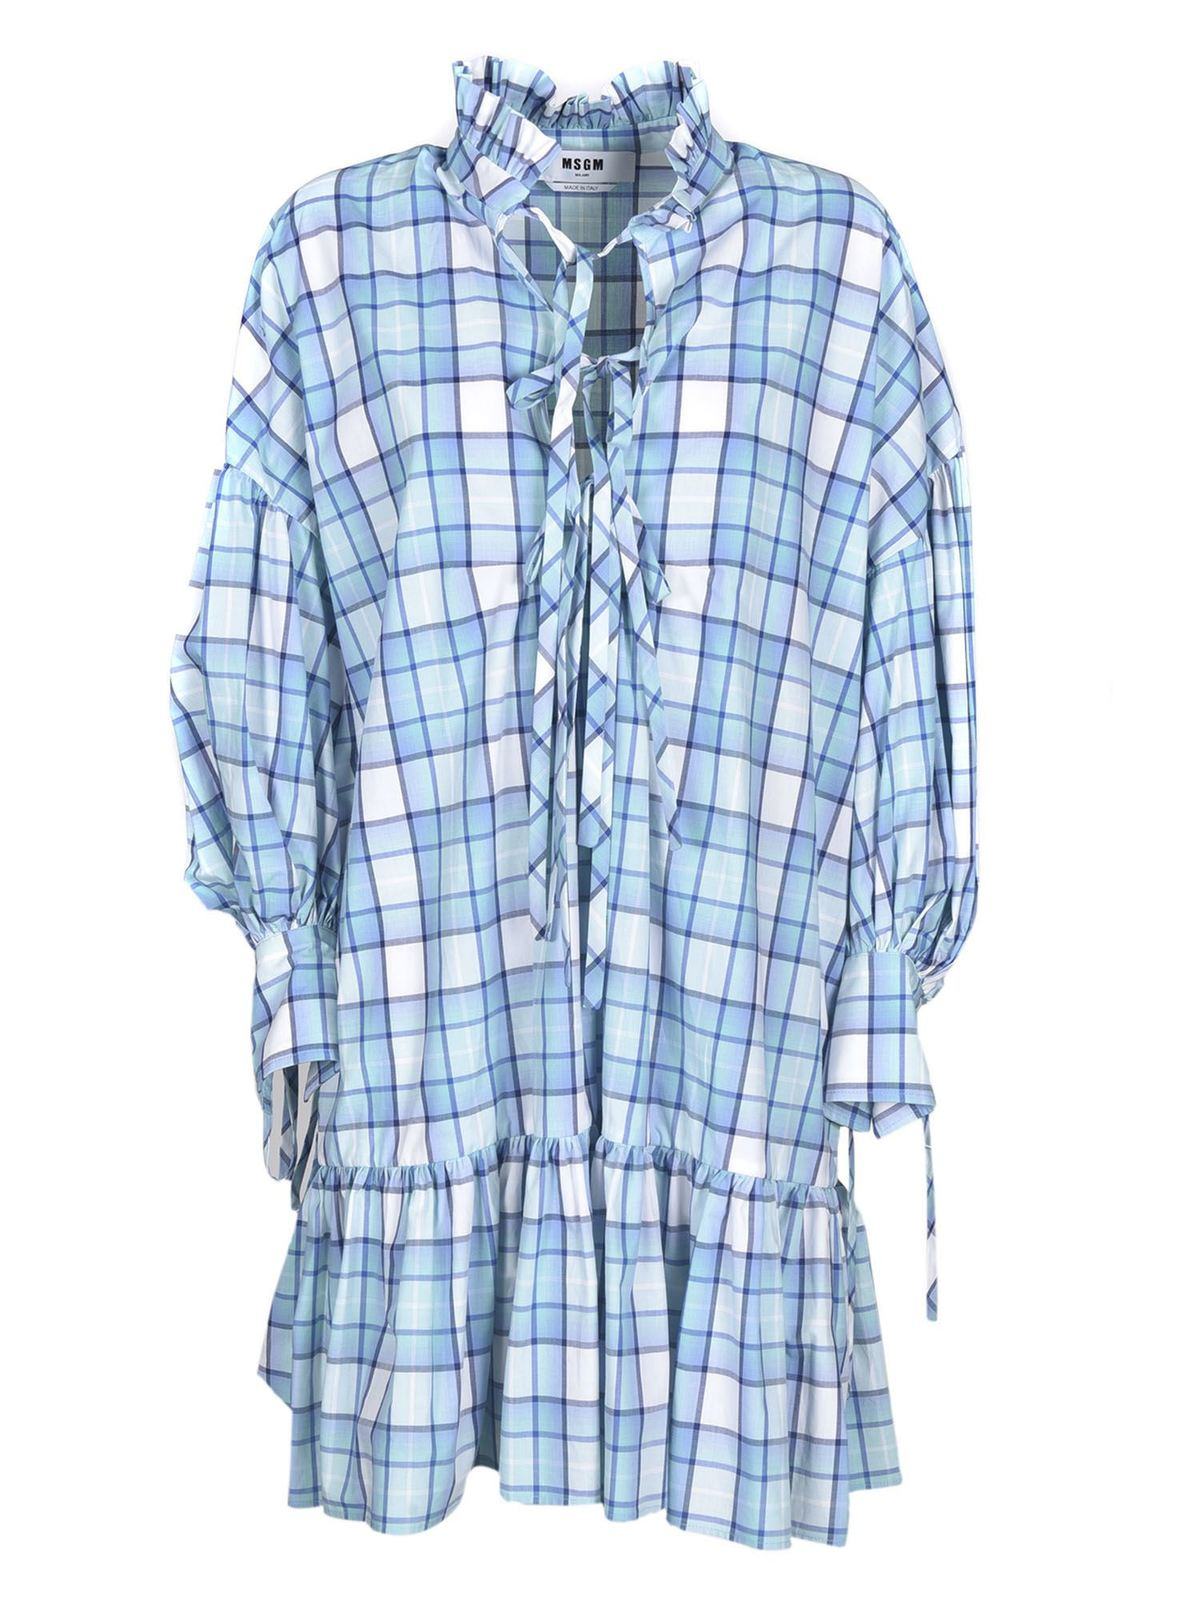 Msgm CHECKED SHIRT DRESS IN LIGHT BLUE